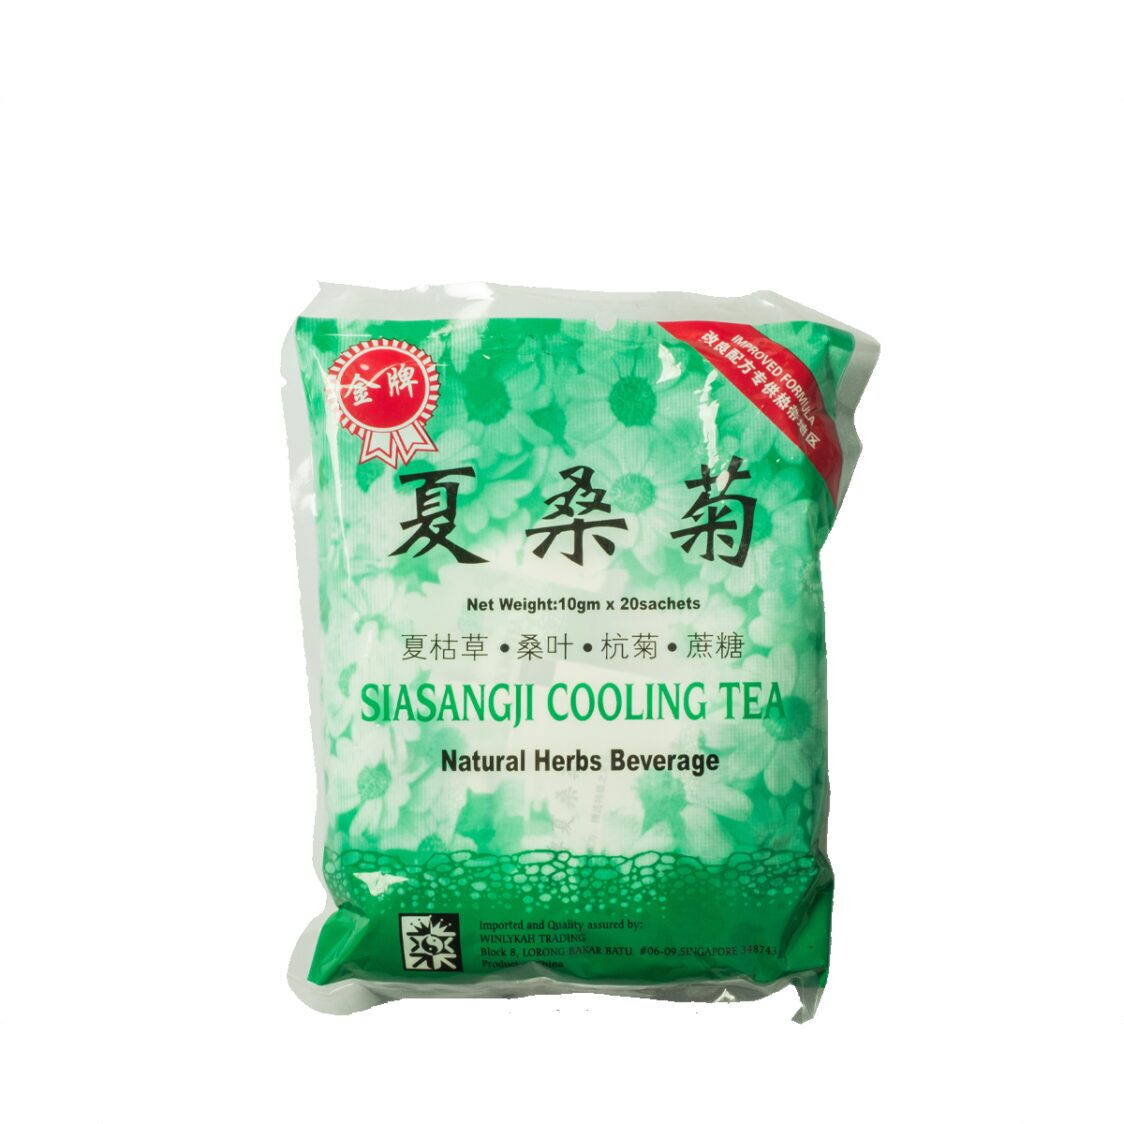 Winlykah TCM Siasangji Cooling Tea